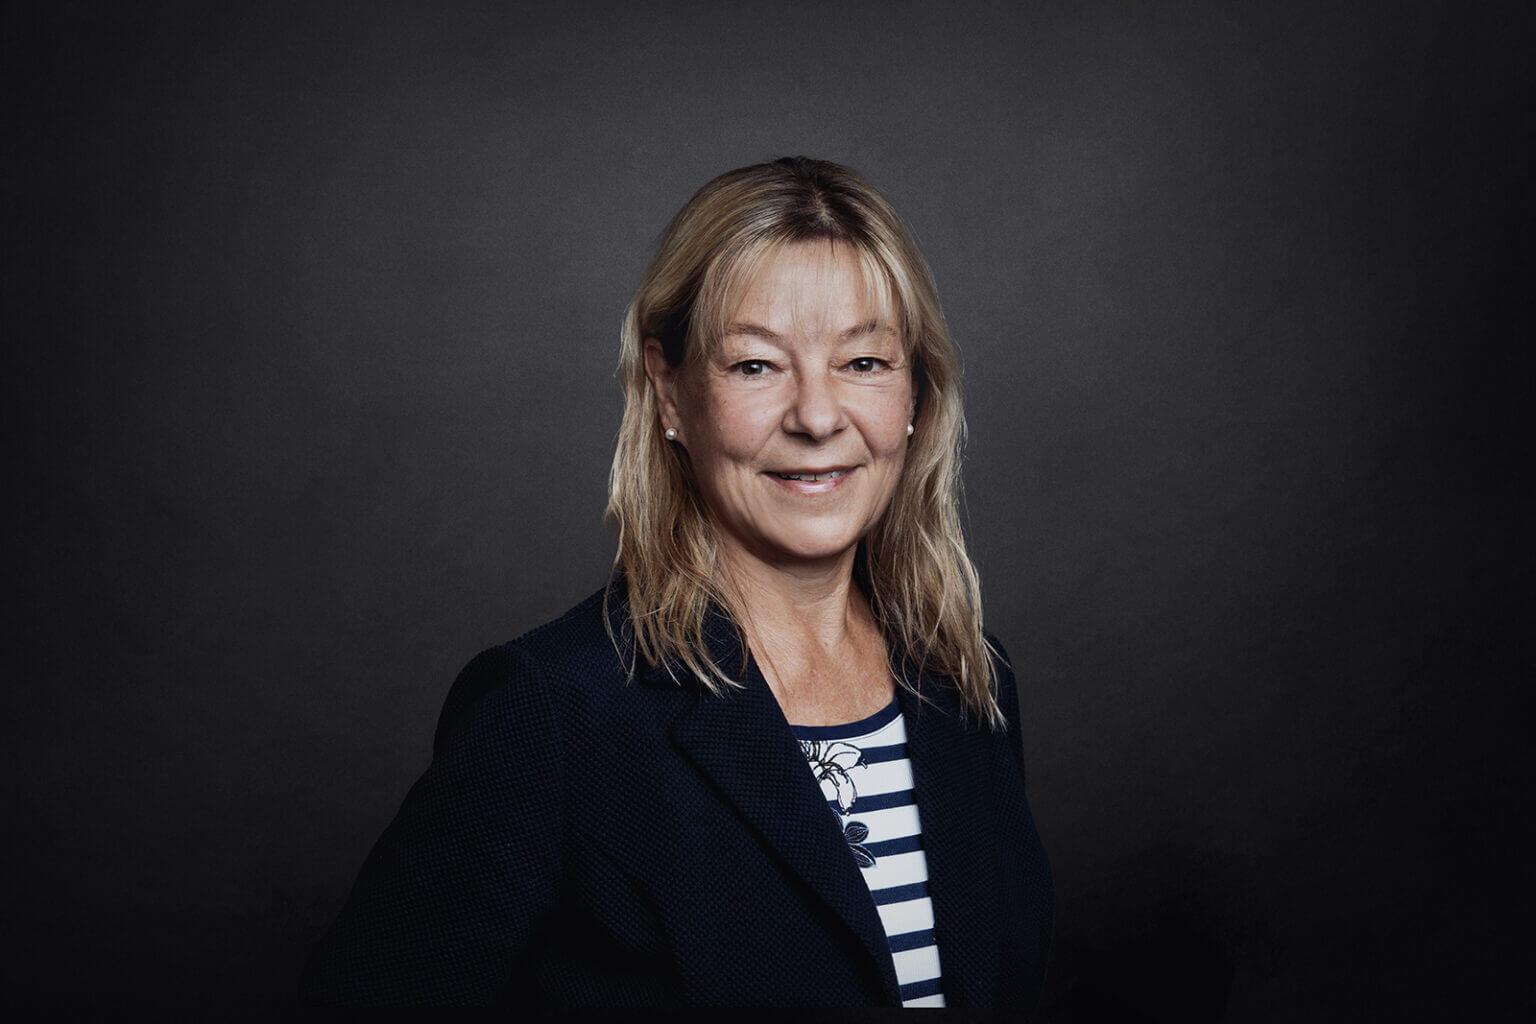 Ursula Reichardt - Dipl.-Kffr., Steuerberaterin